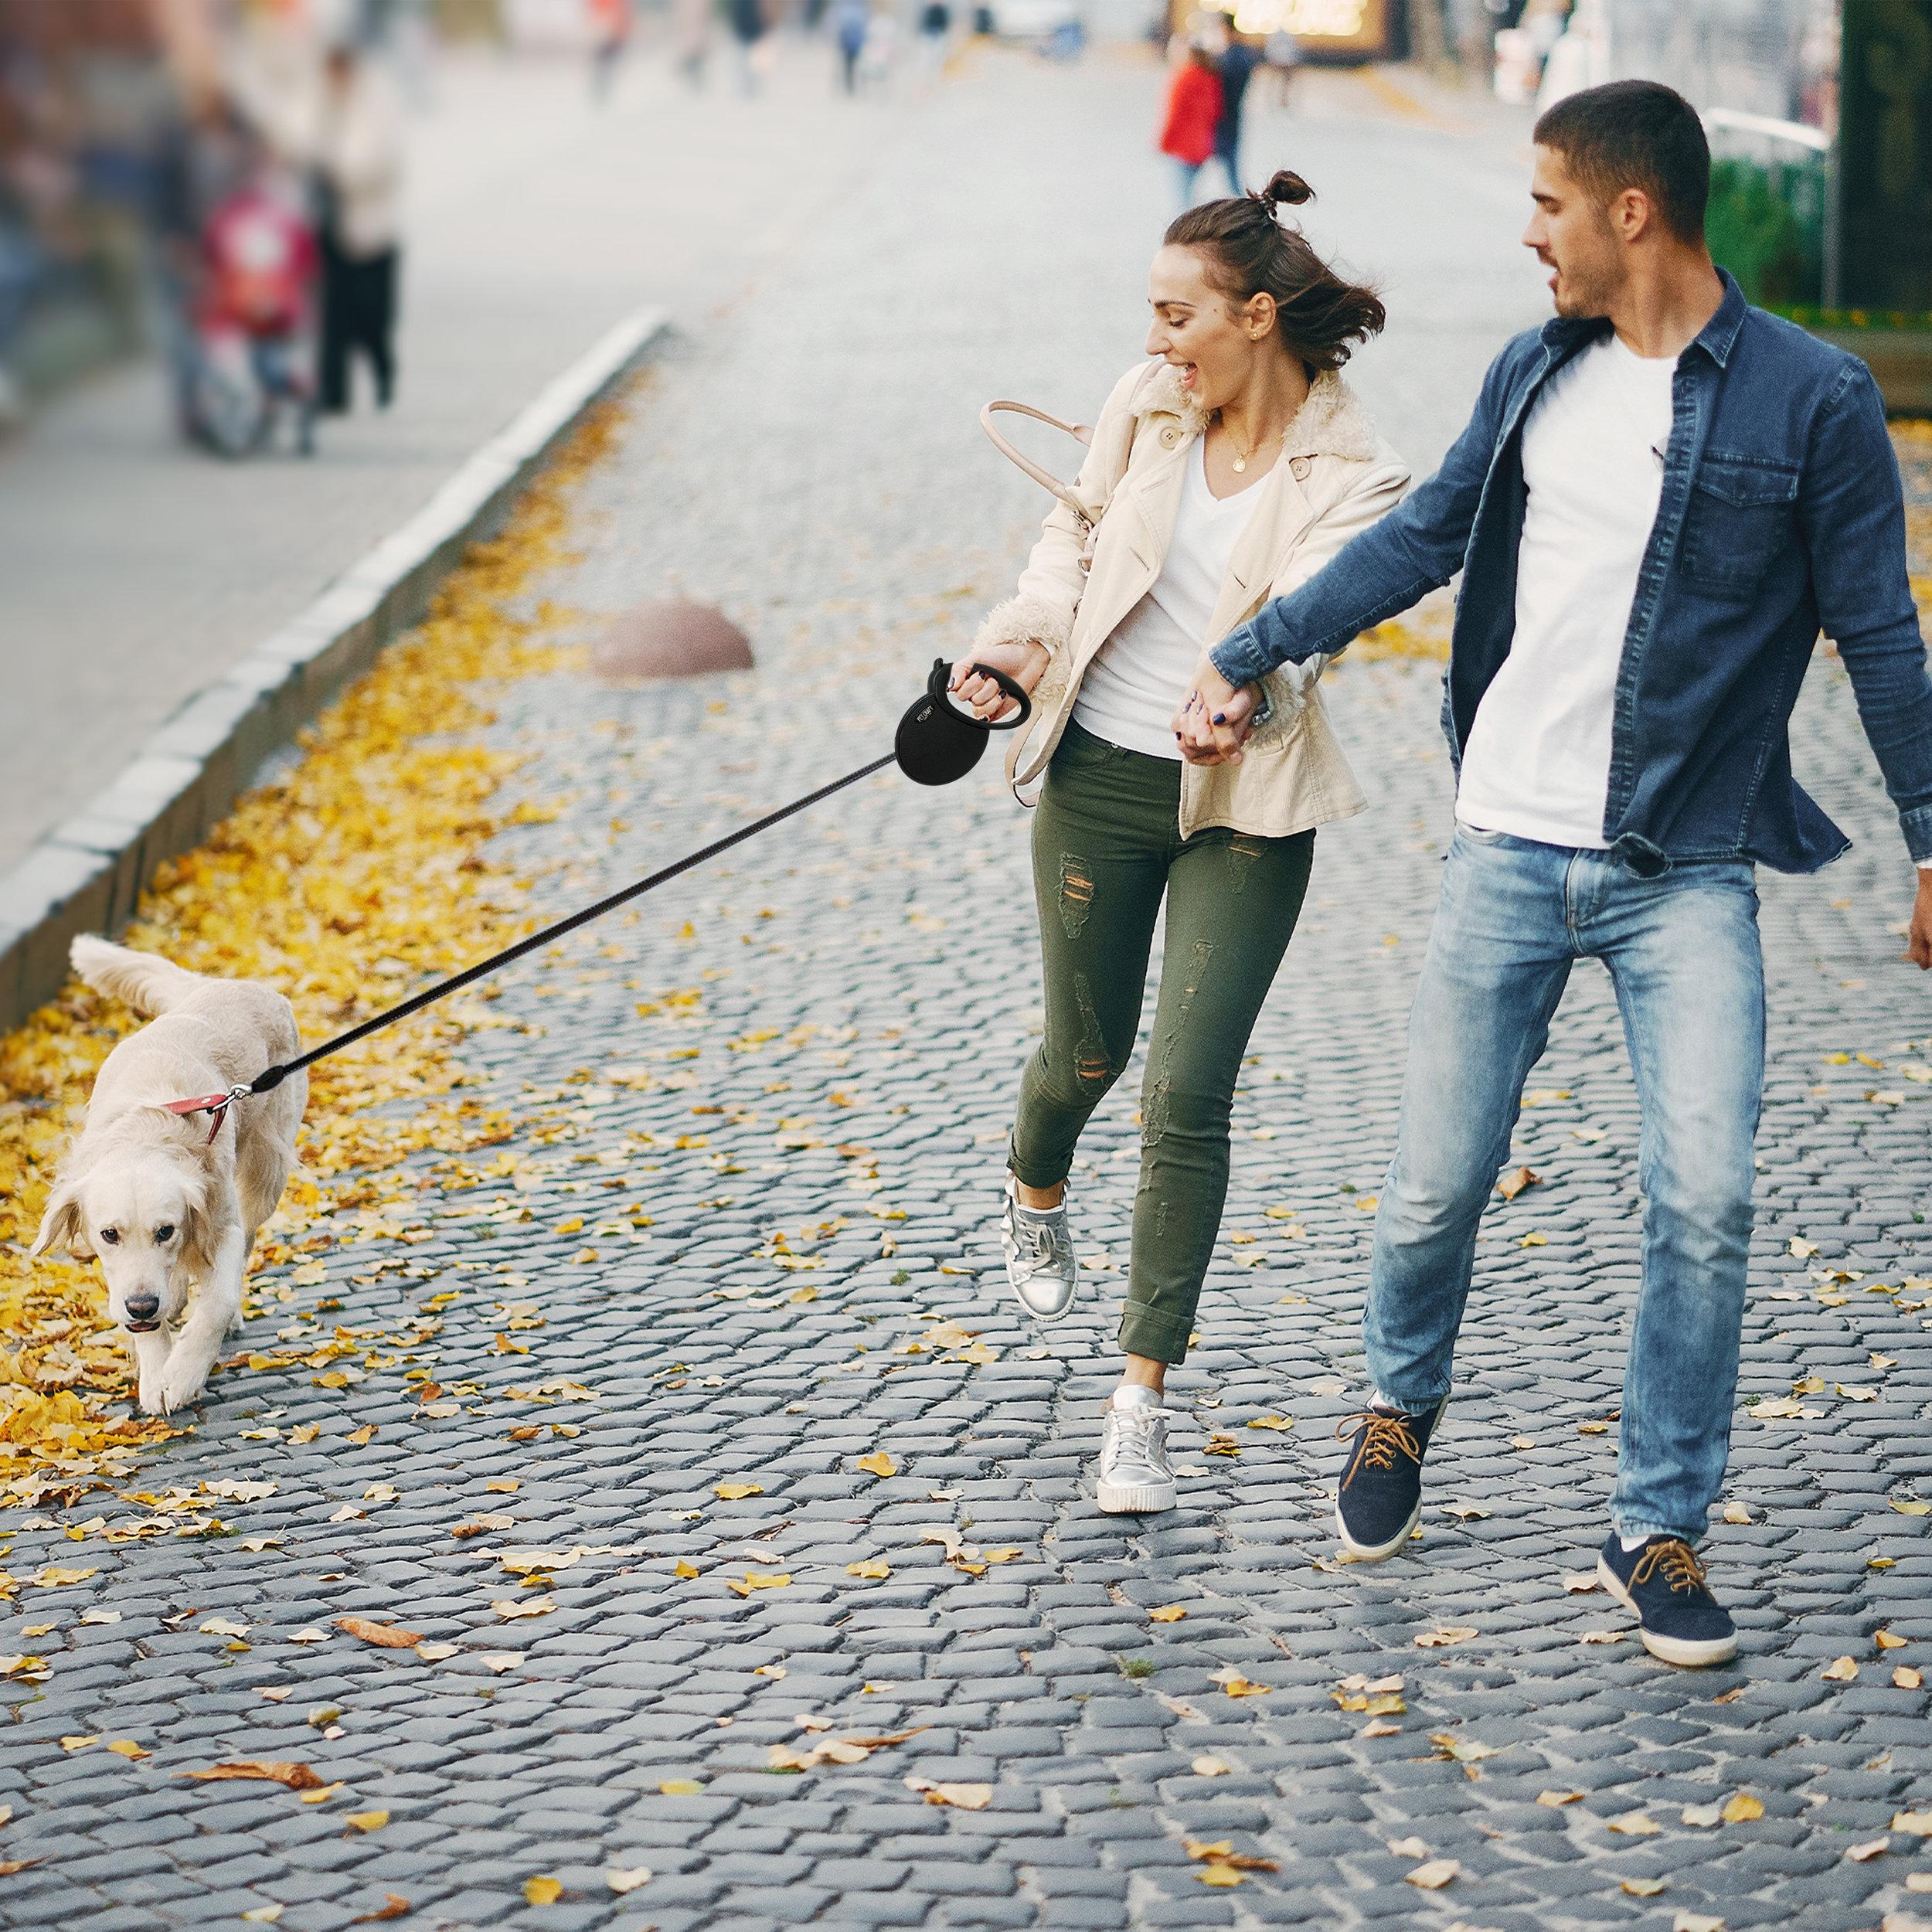 Pet Craft Supply Heavy Duty Durable Retractable Dog Walking Leash